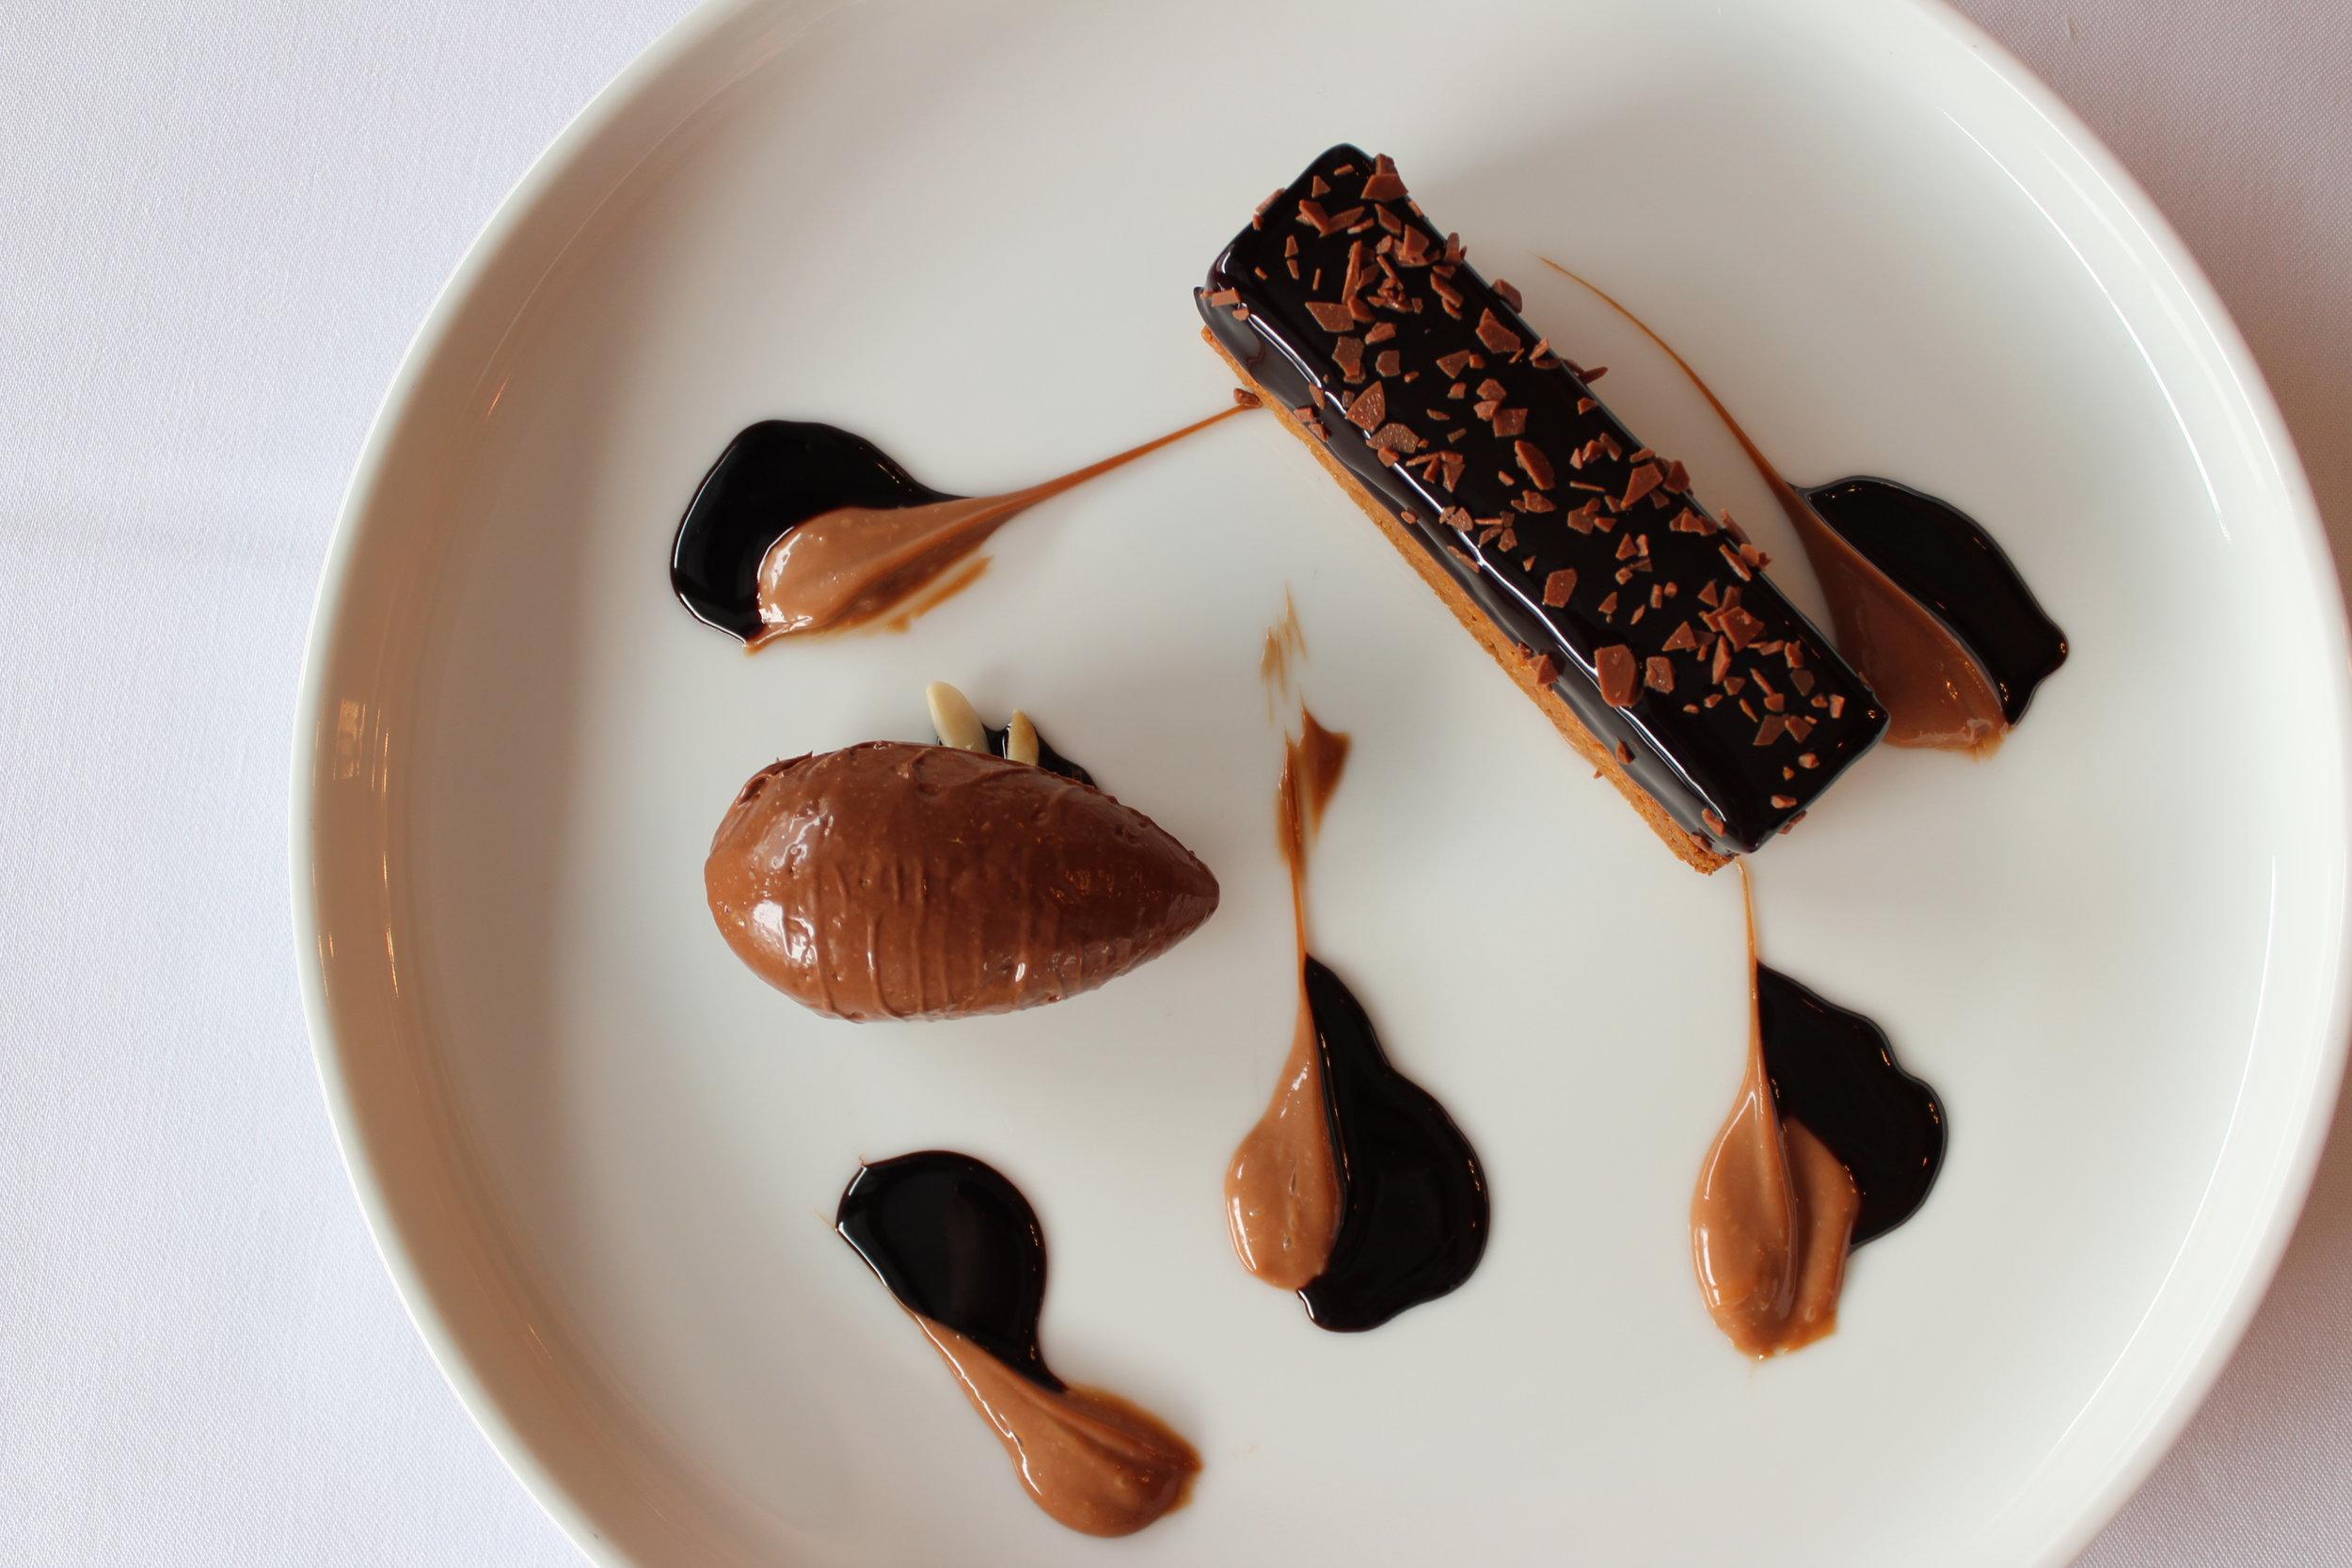 Dark & Milk Chocolate Dessert bar from Bagatelle New York City